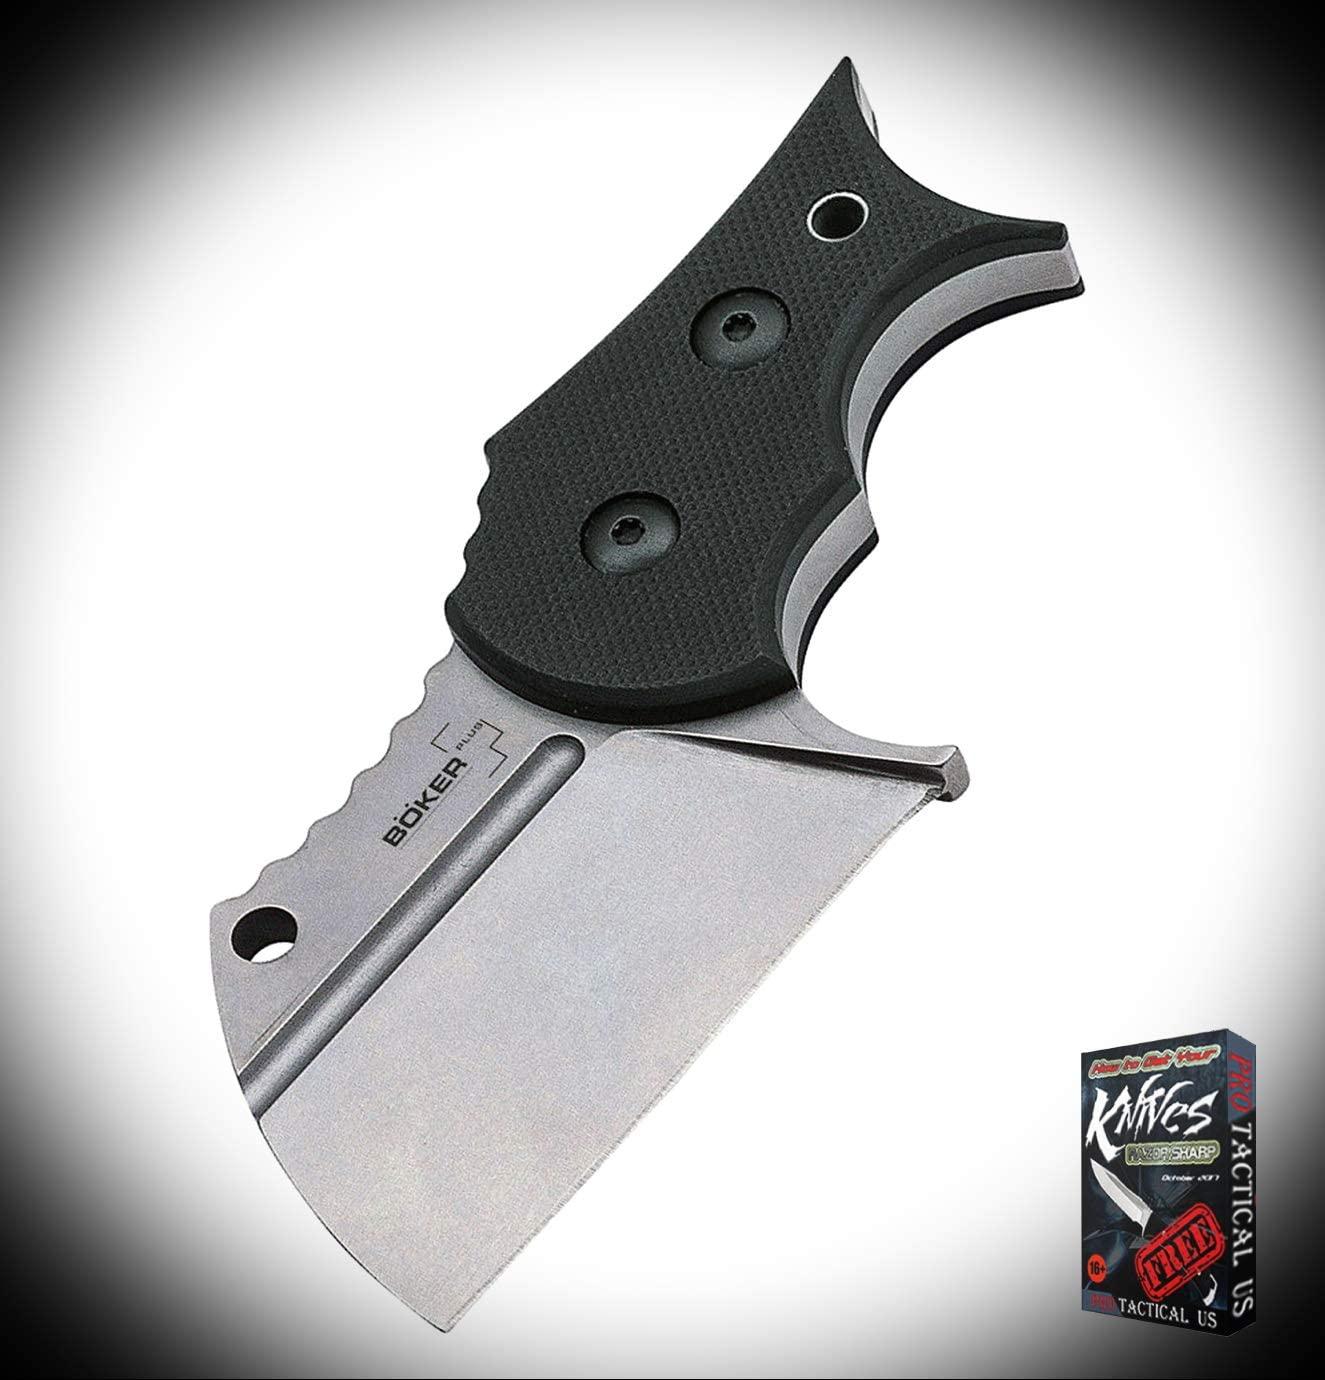 New Plus URD 2.0 Black G10 D2 Steel Full Tang Fixed Blade Neck ProTactical Elite Knife PBO2829RT + Free eBook